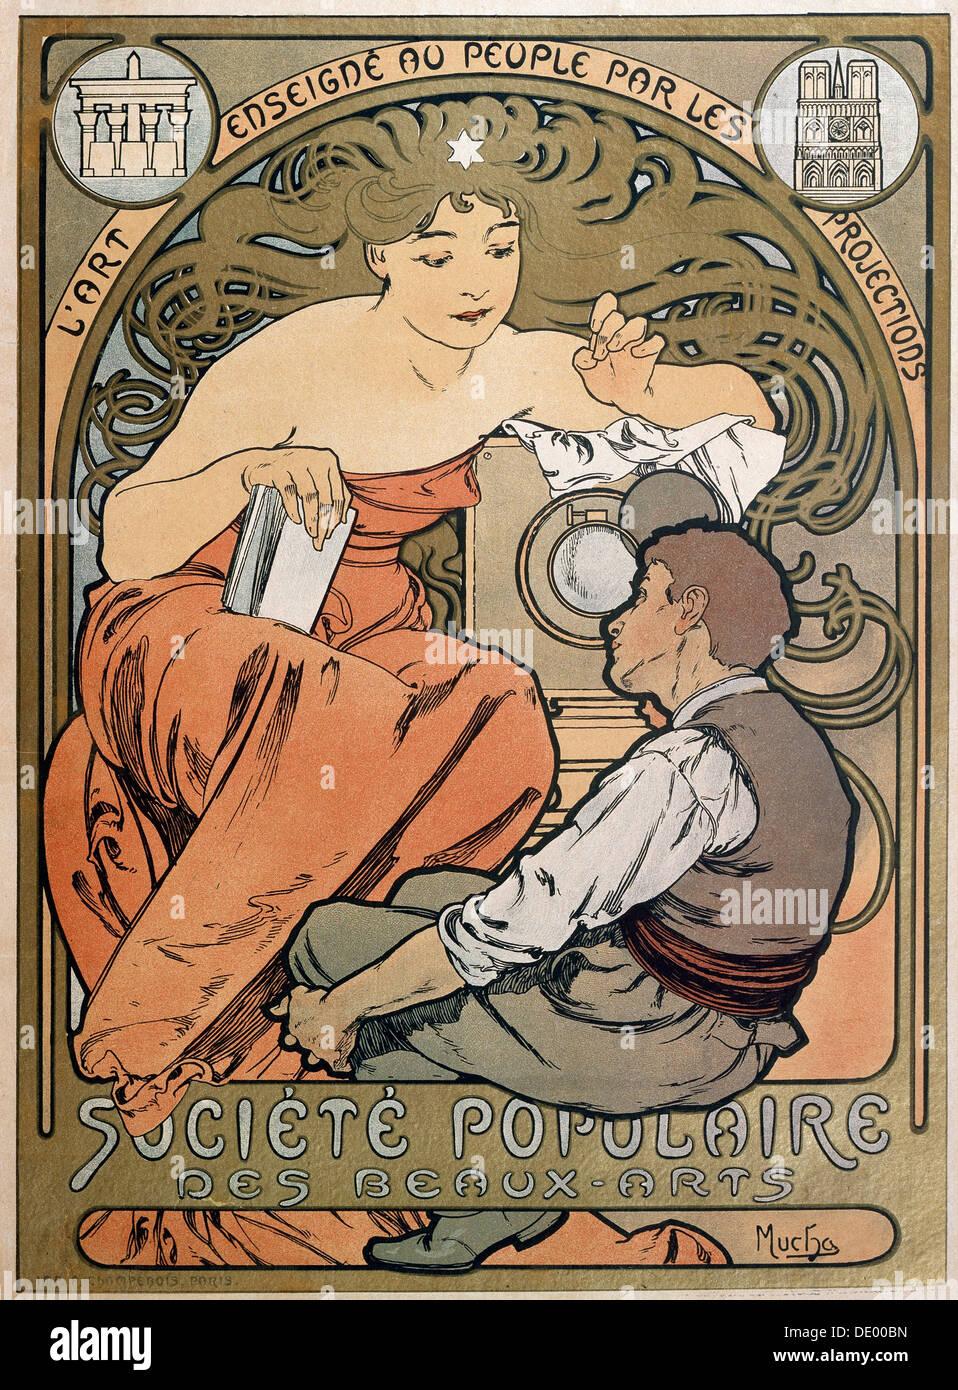 Poster per la Societe Populaire des Beaux Arts, 1897. Artista: Alphonse Mucha Foto Stock